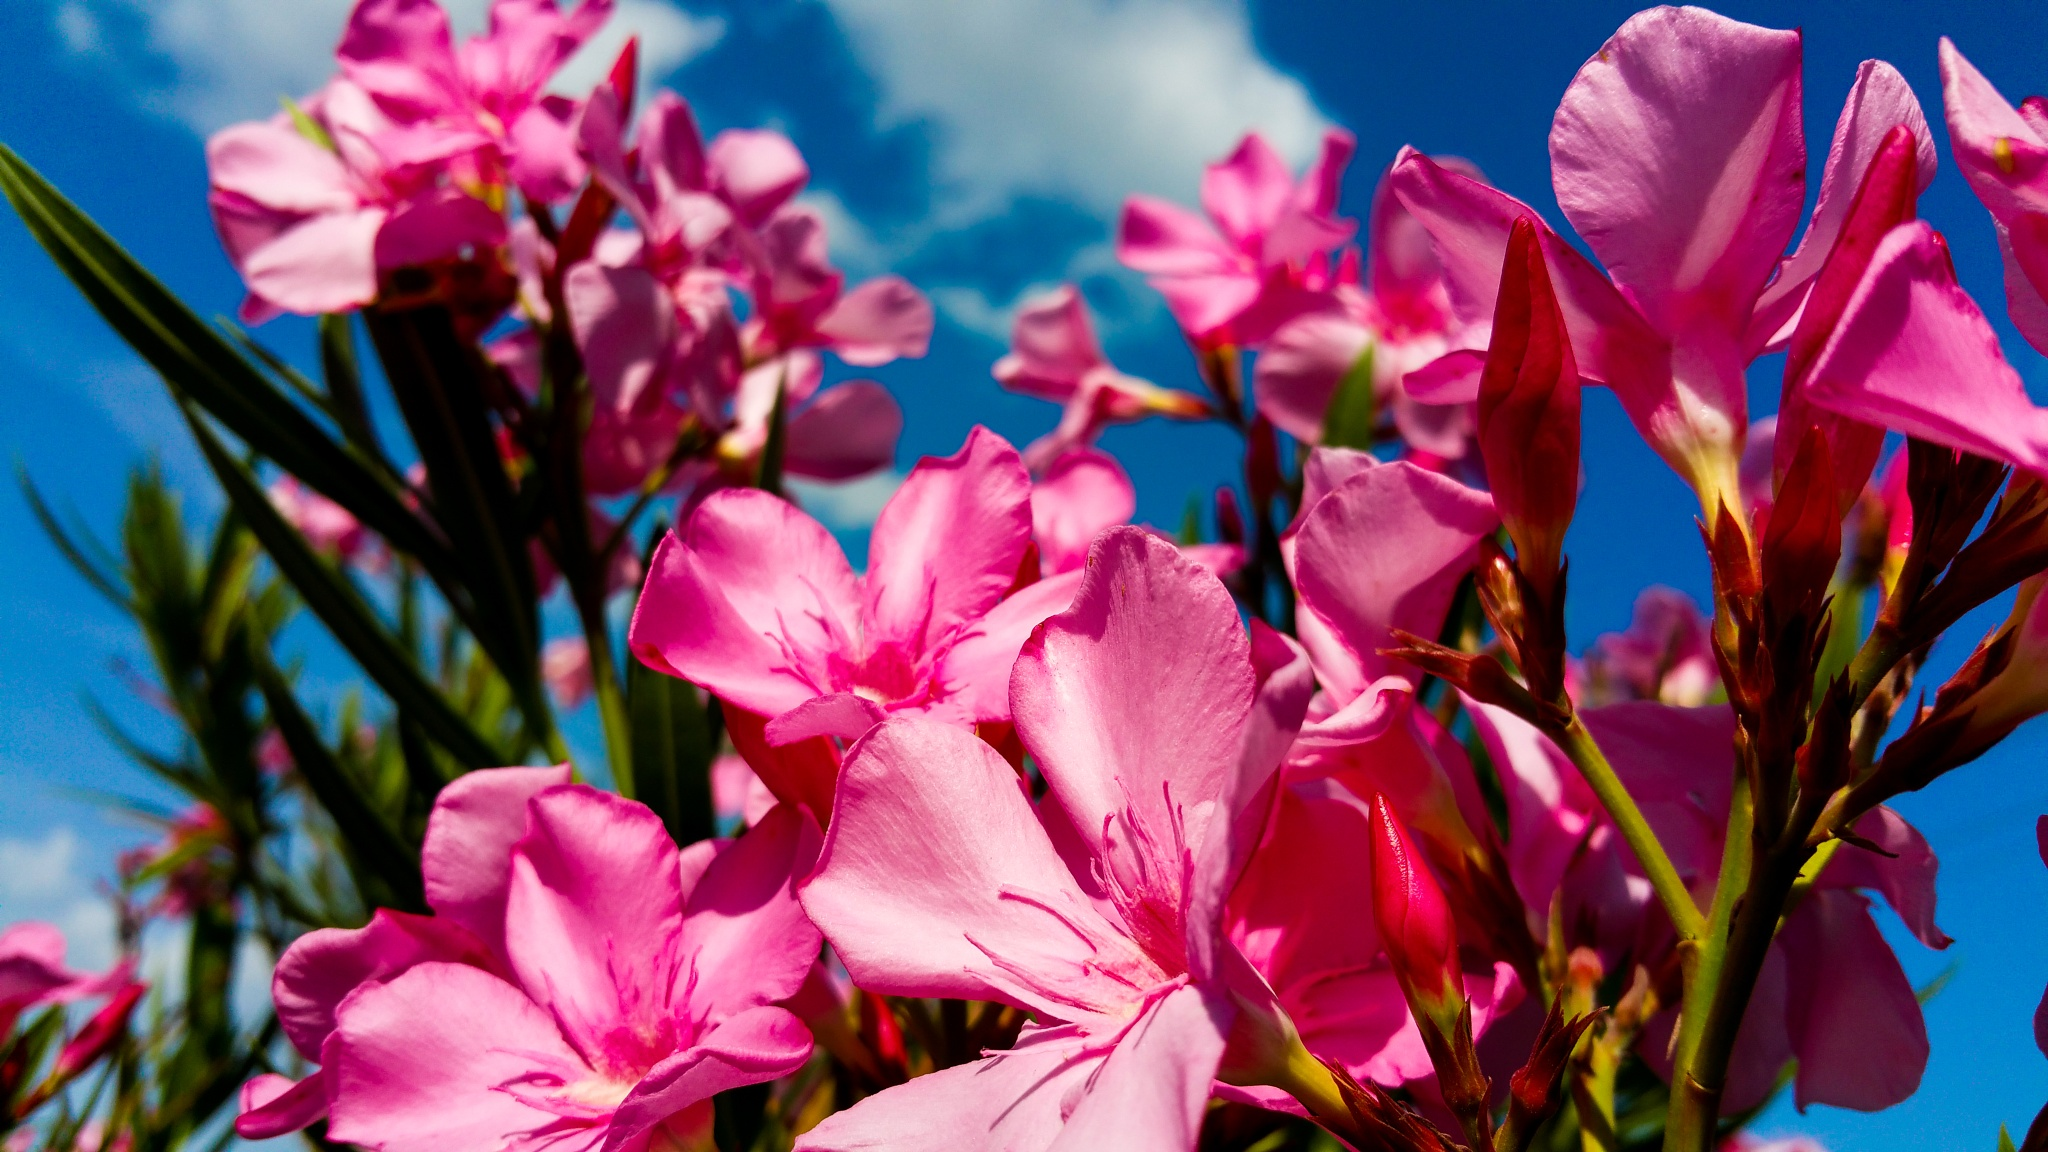 Oleander by Anthony Evans